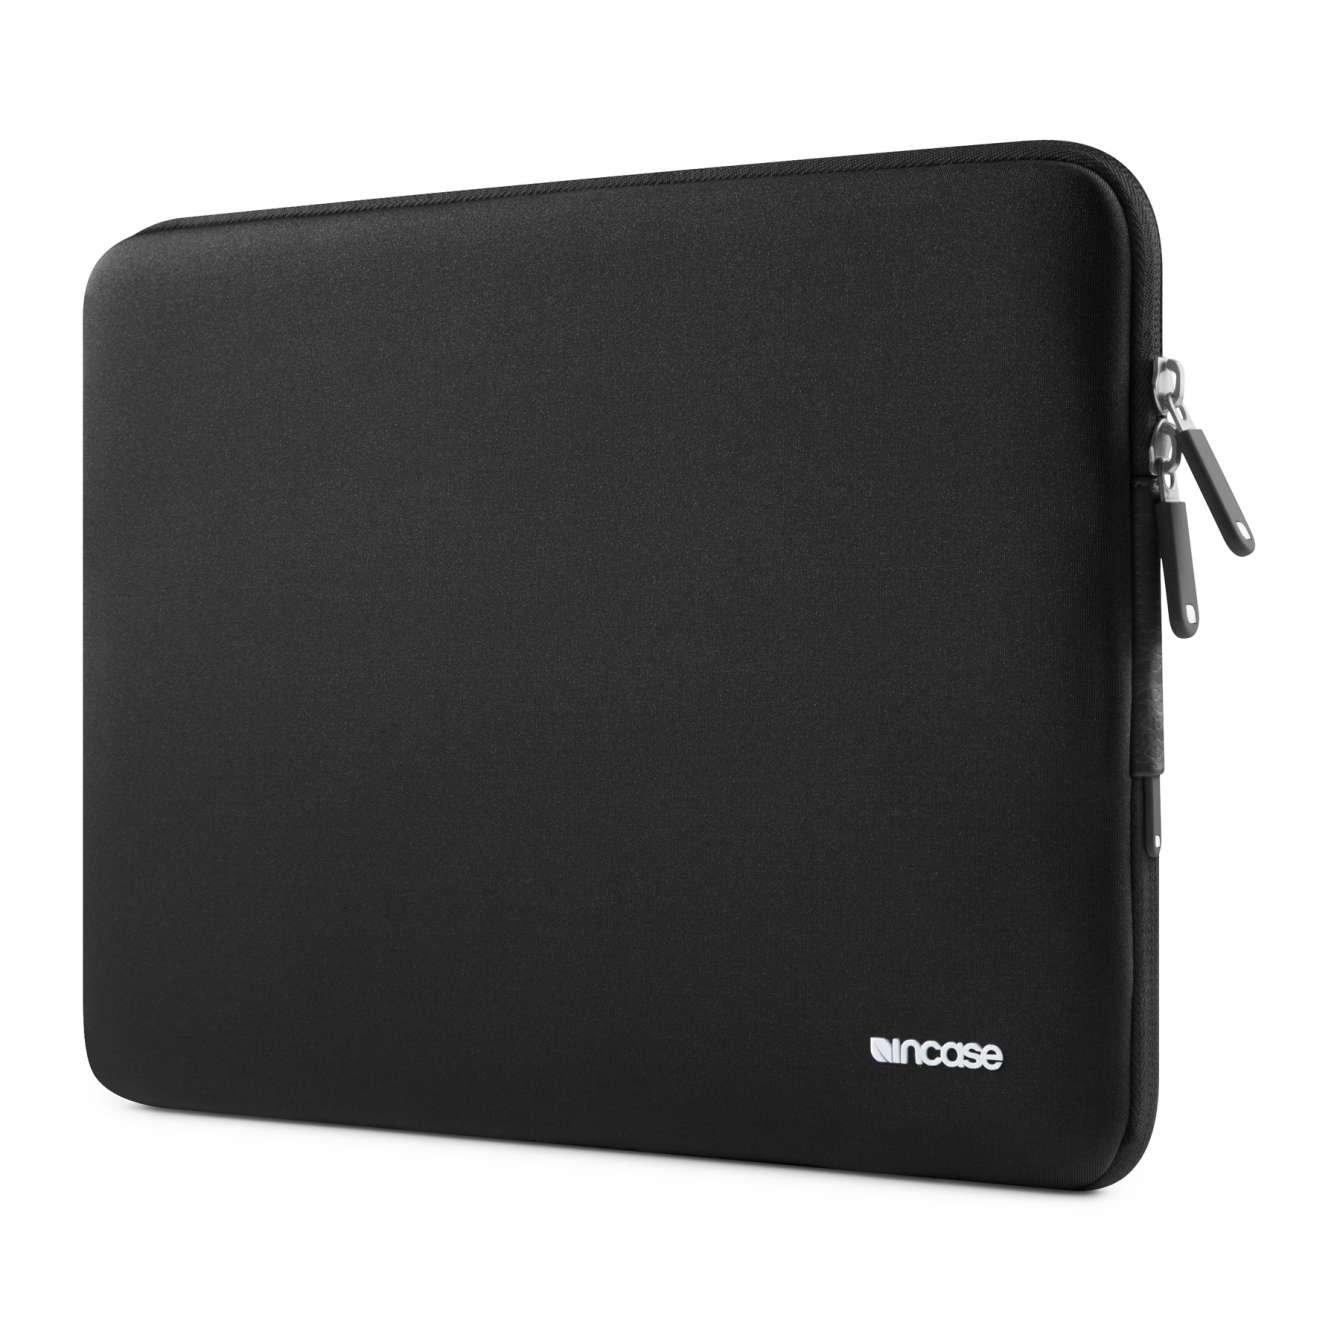 Neoprene Pro Carrying Case (Sleeve) for 13'' MacBook Air, MacBook Pro, MacBook Pro (Retina Display) - Black